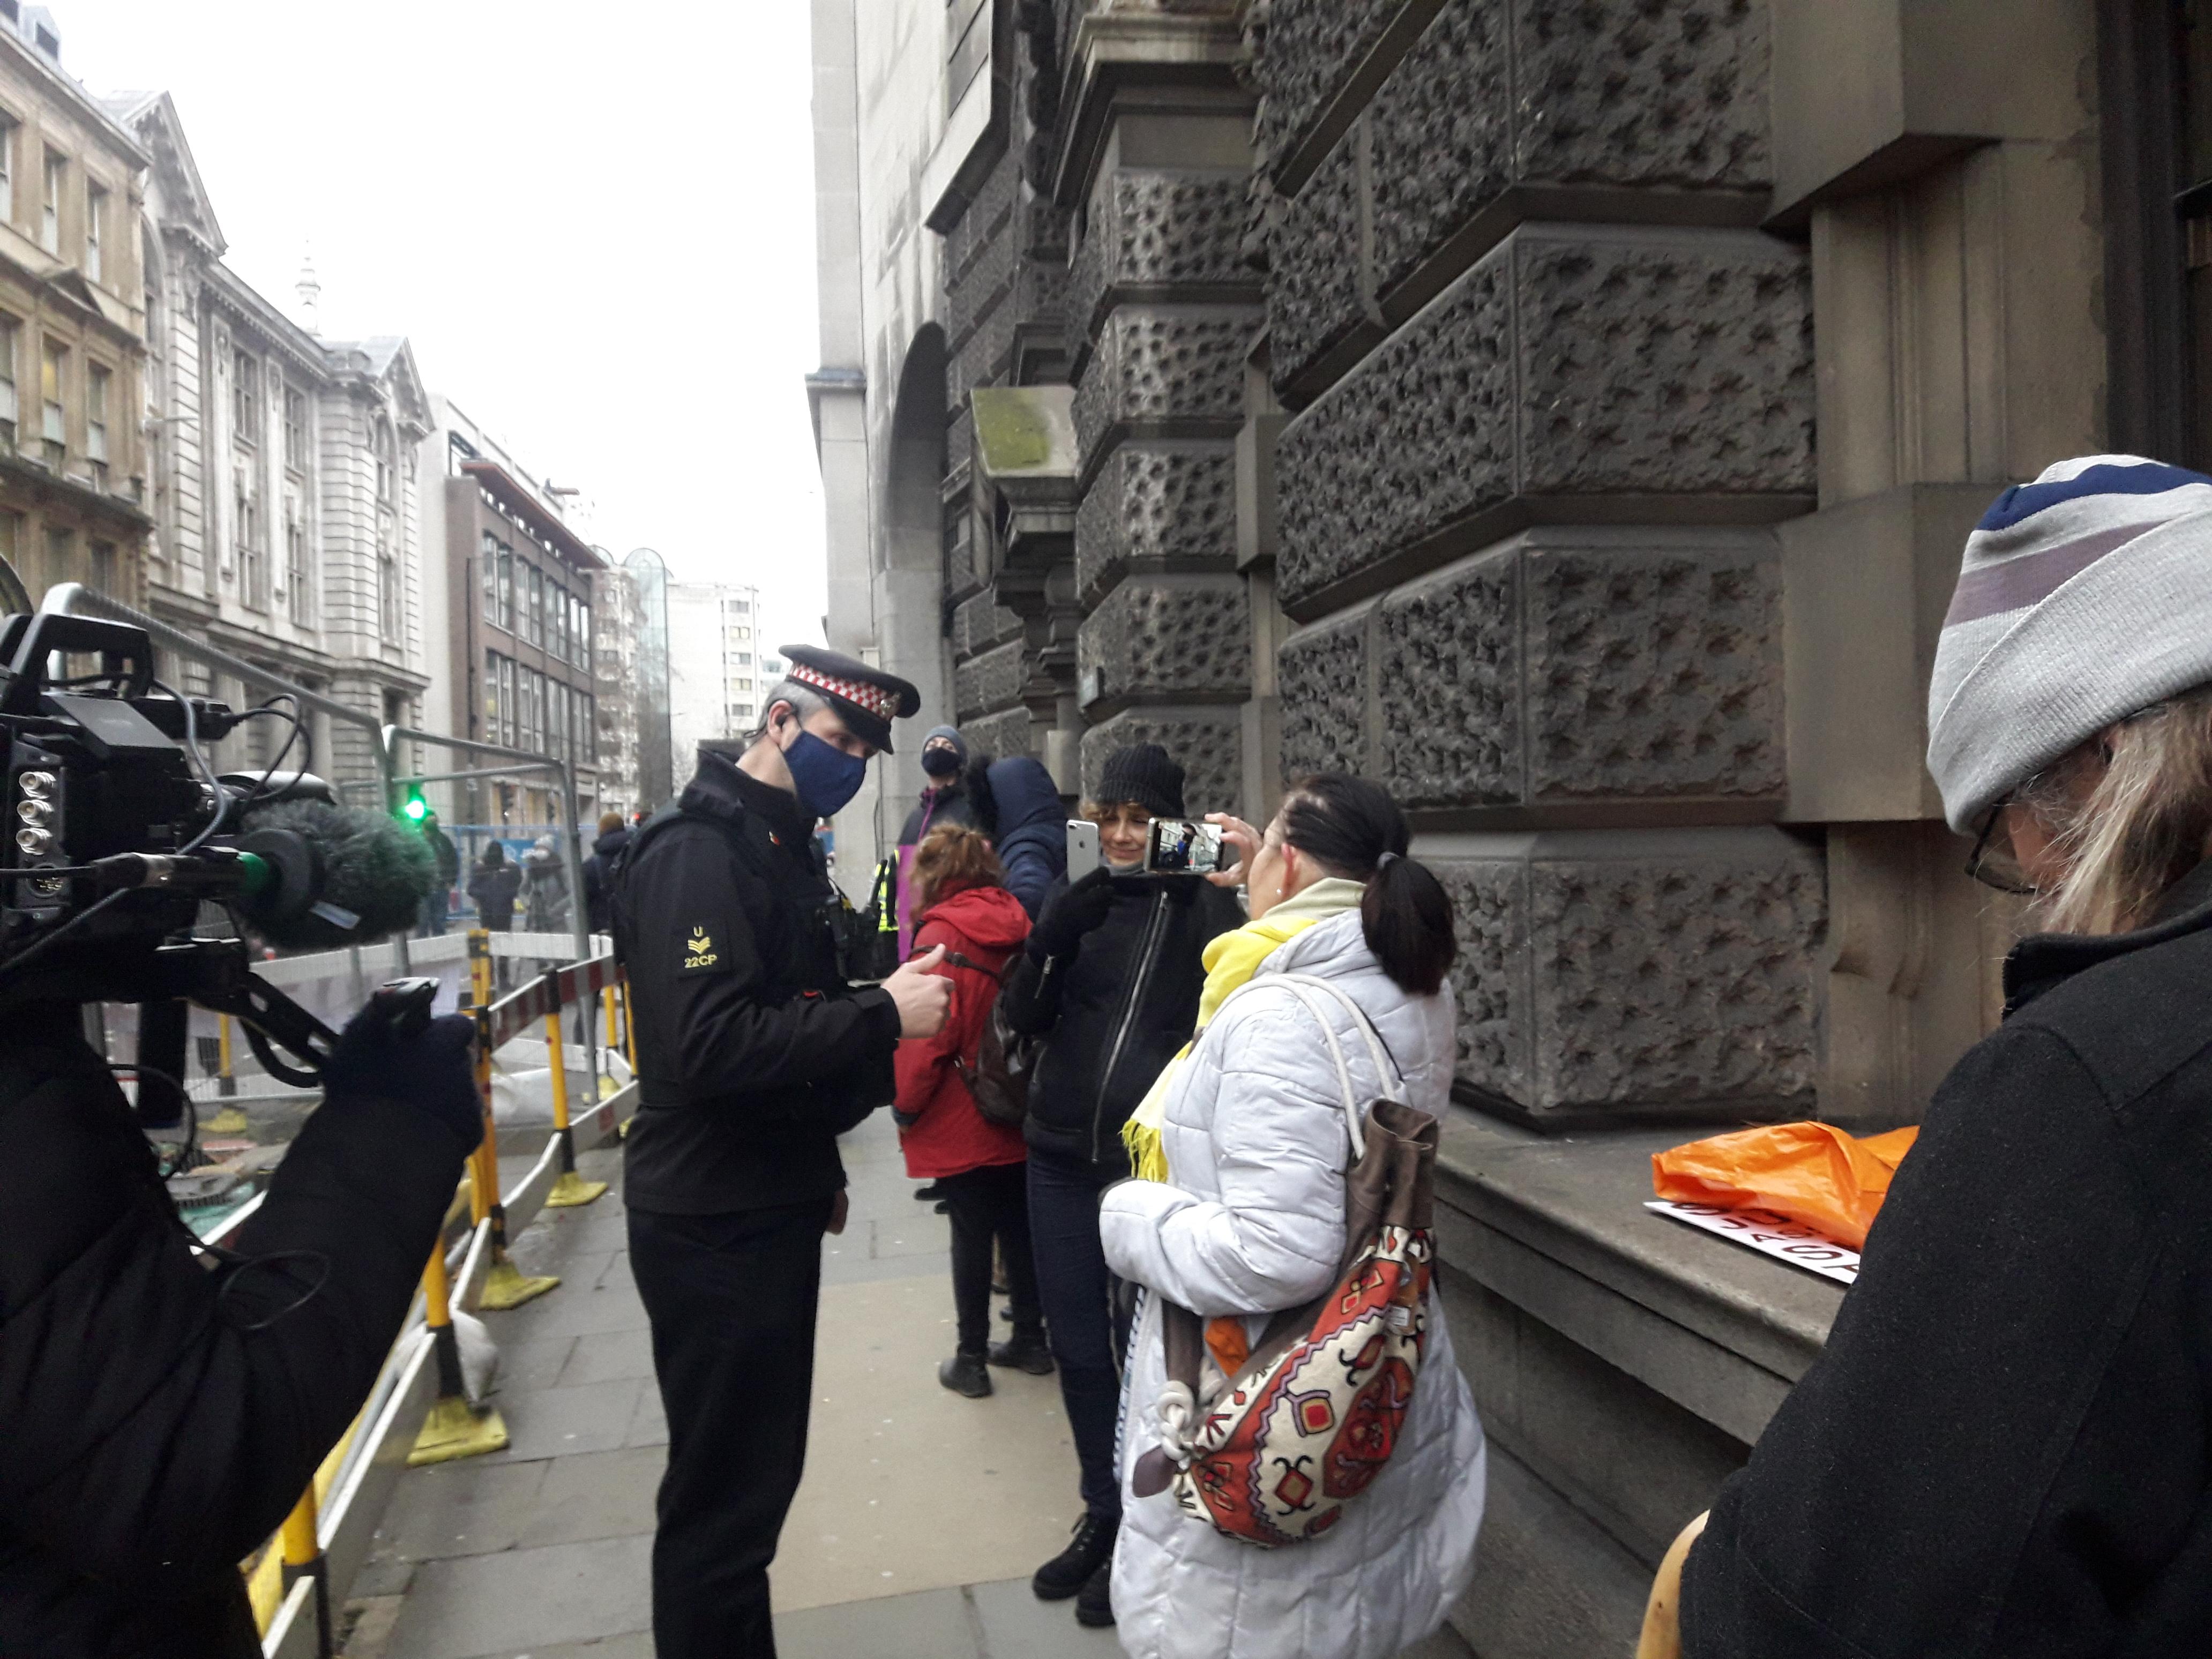 protest_photos:copsharassoldb.jpg